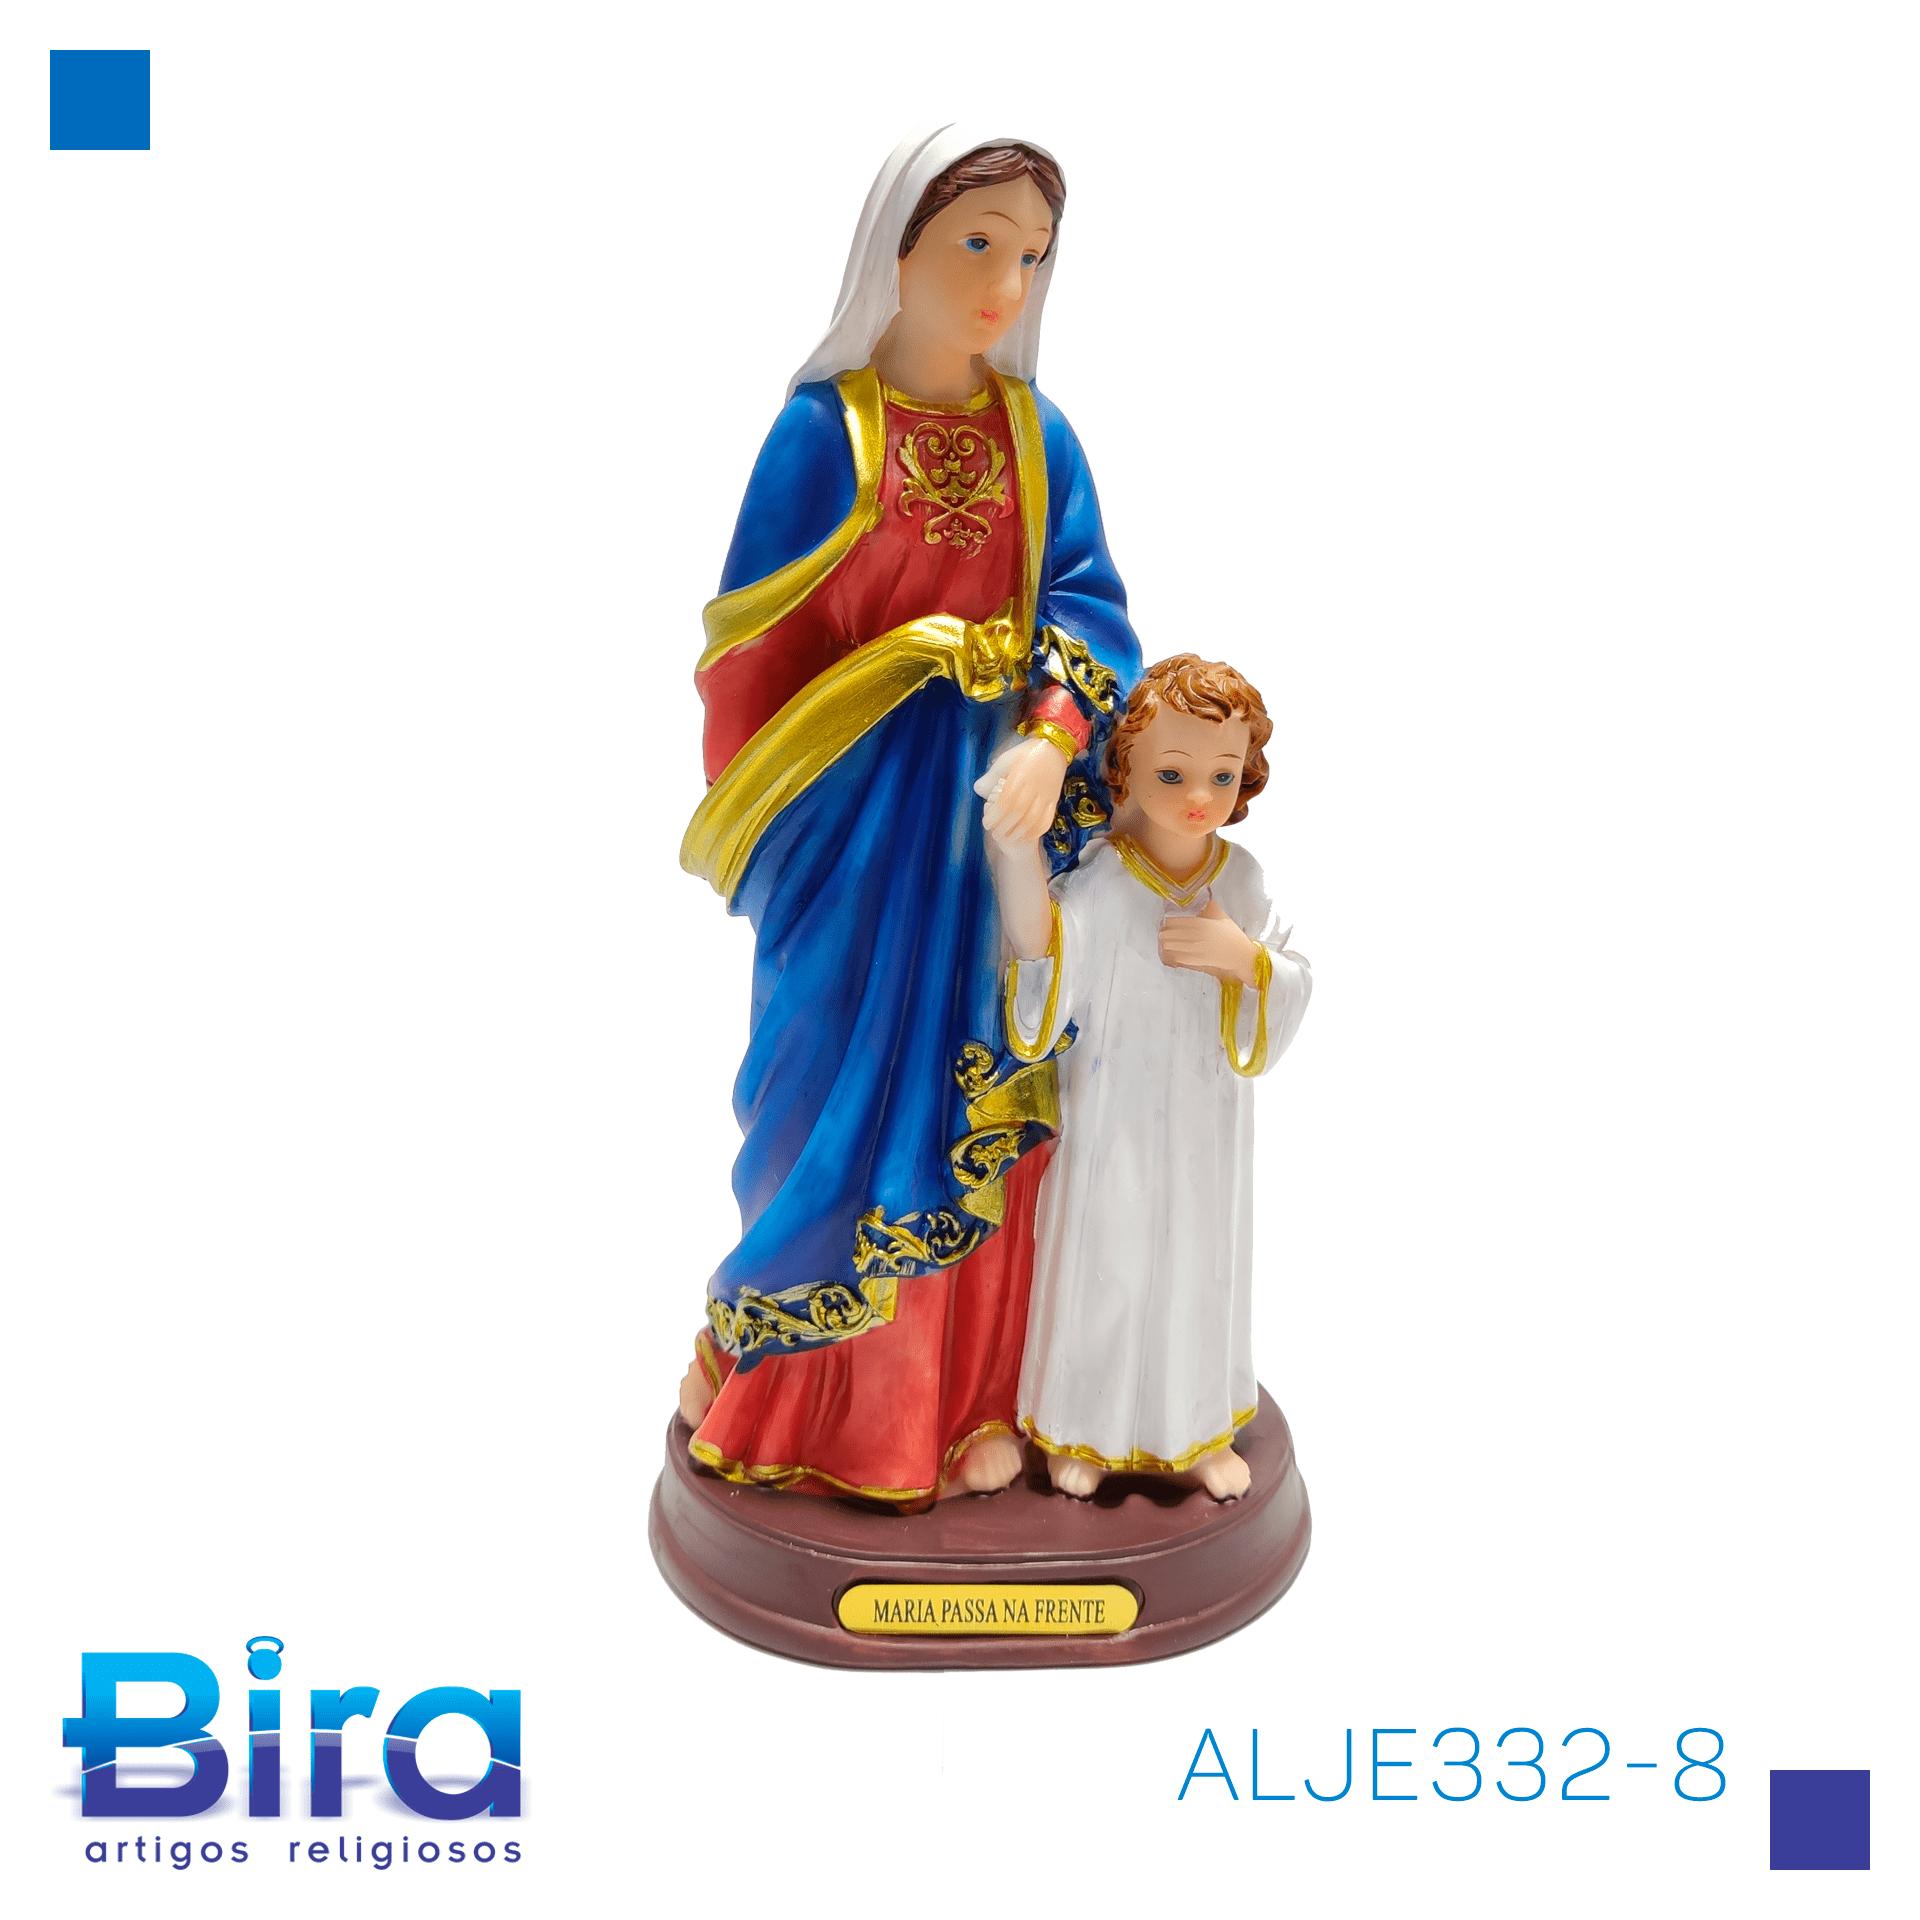 Bira Artigos Religiosos - MARIA PASSA NA FRENTE 20,5 CM - Cód. ALJE332-8